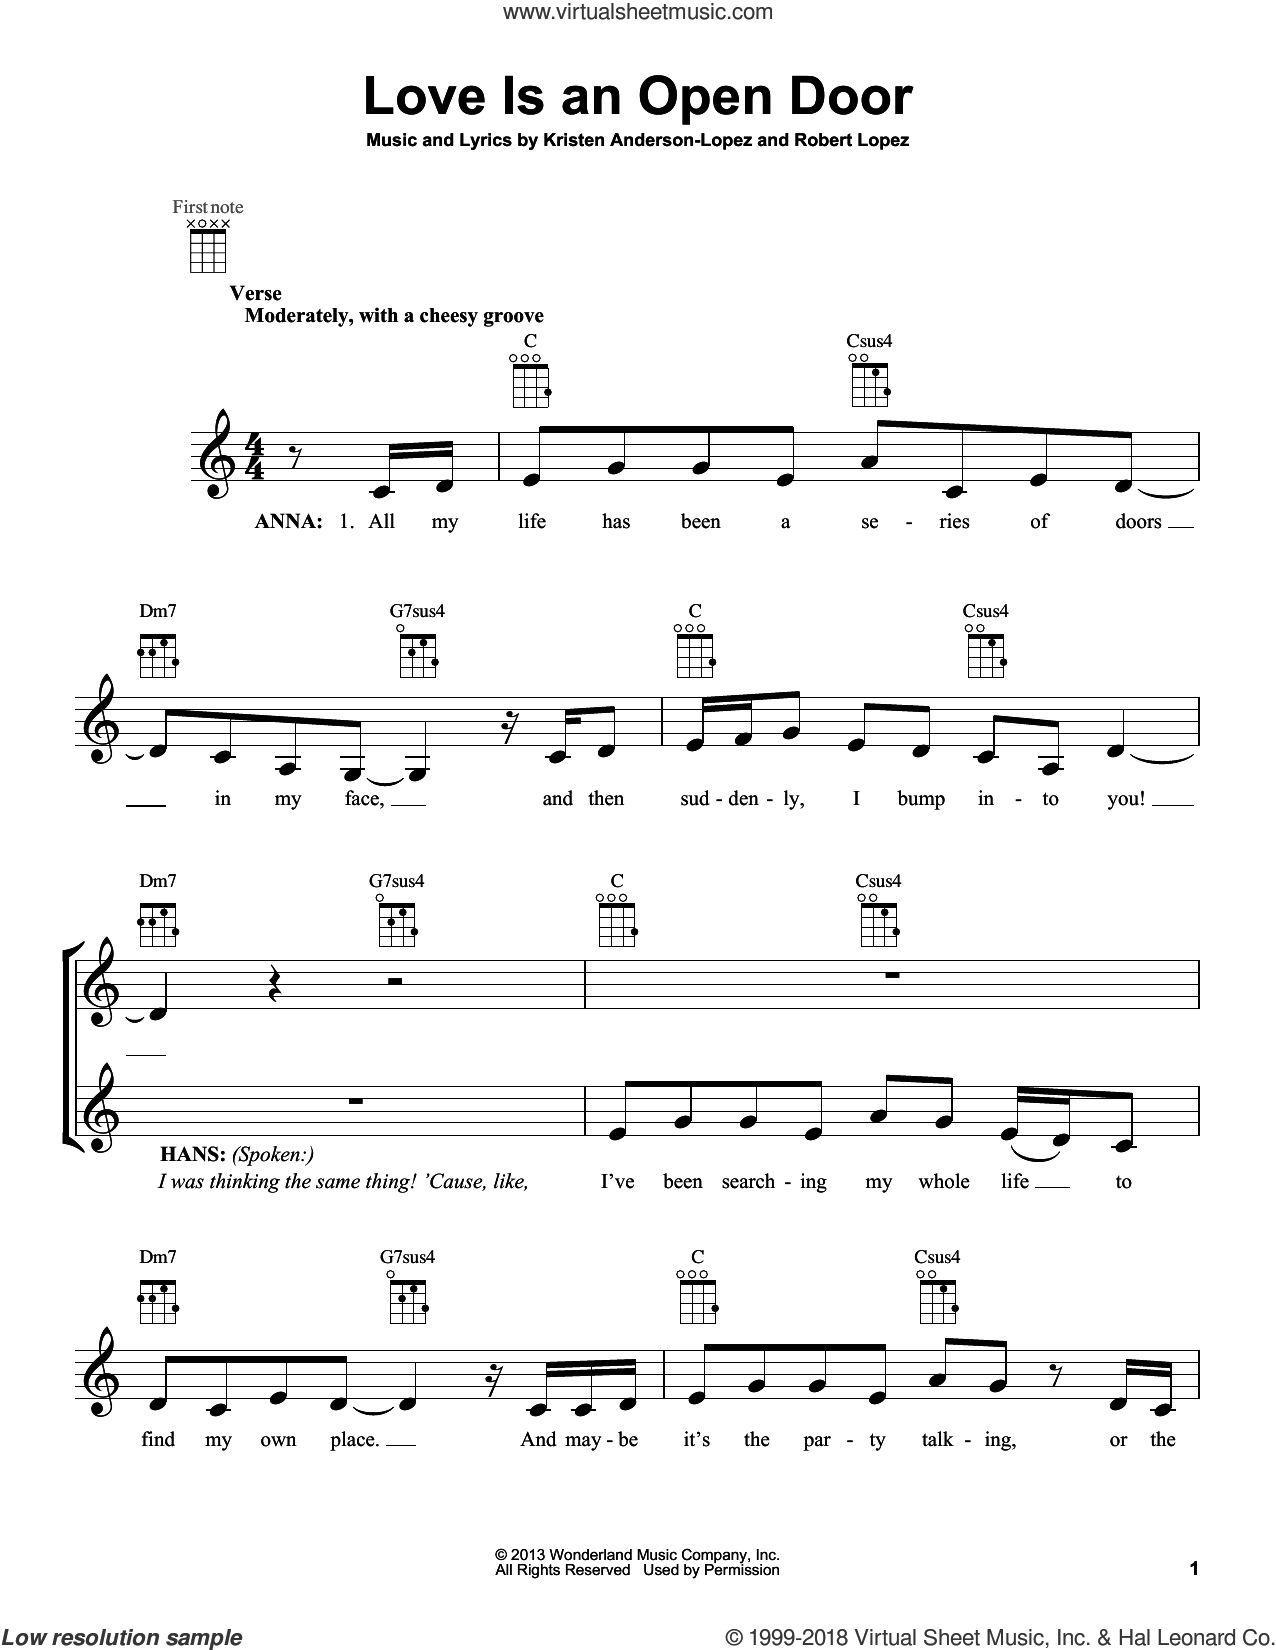 Love Is An Open Door (from Disney's Frozen) sheet music for ukulele by Kristen Bell & Santino Fontana, Kristen Anderson-Lopez and Robert Lopez, intermediate skill level